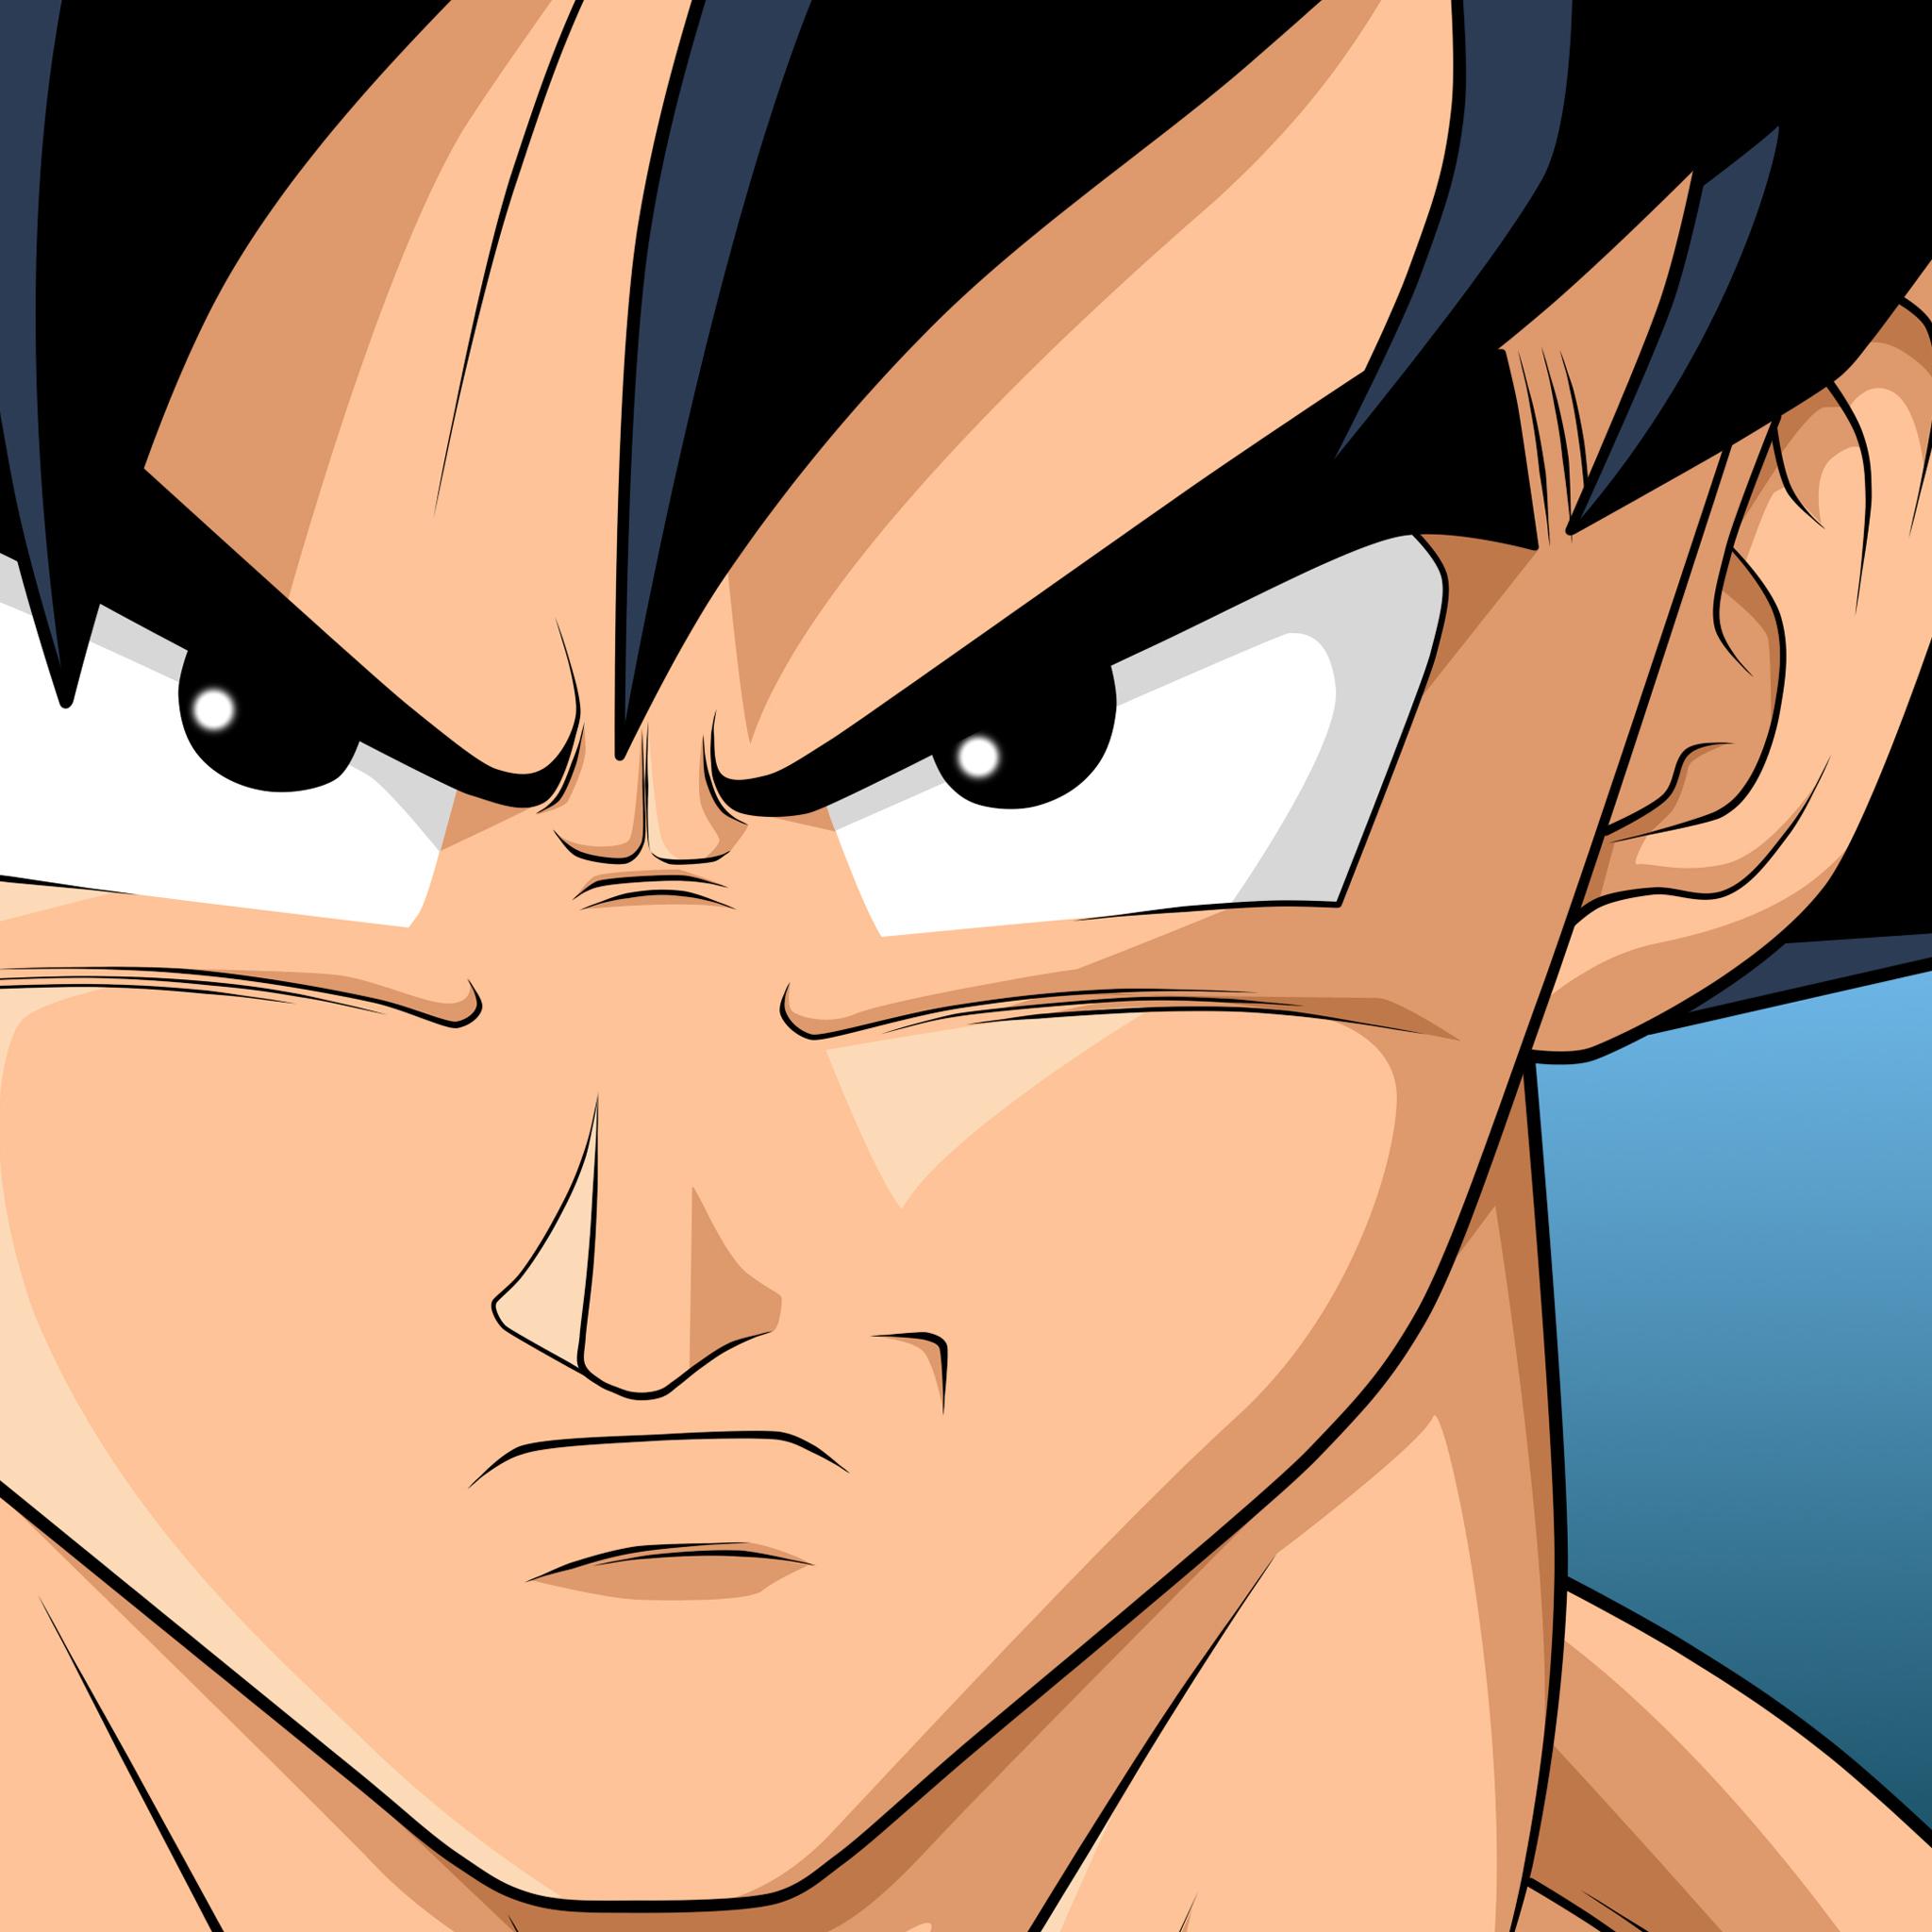 Goku_3_Wallpapers_iPad